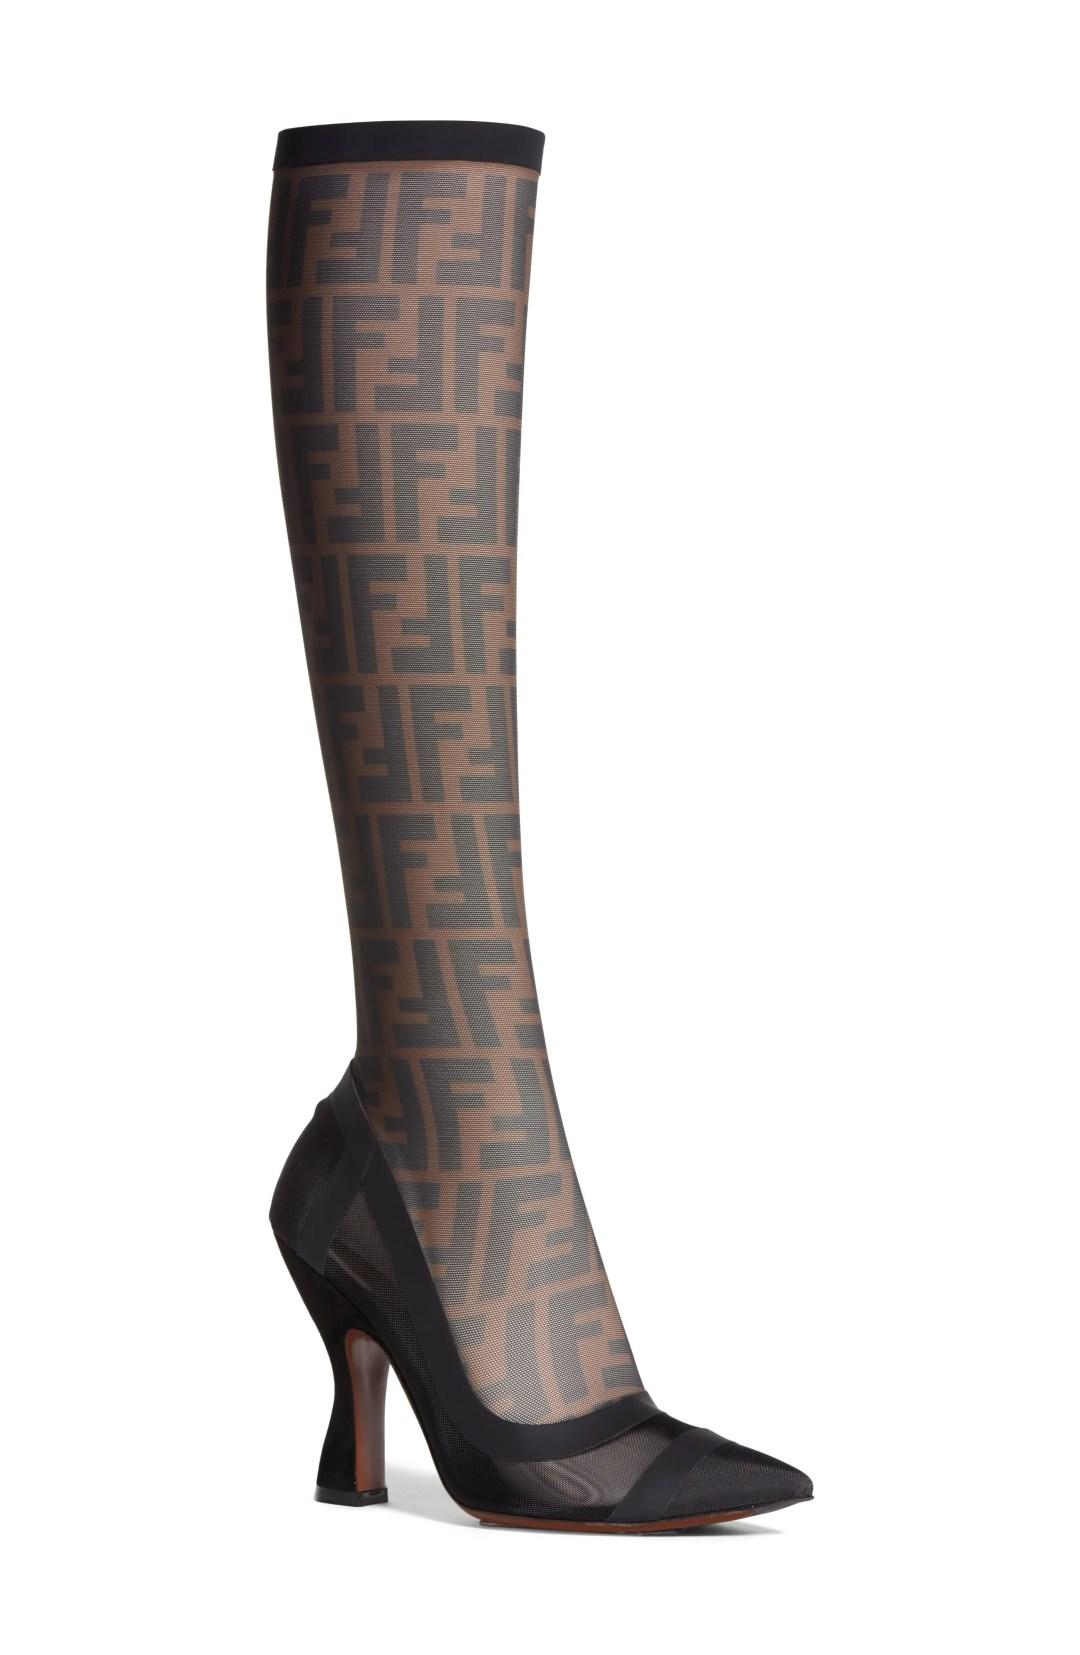 d9c1d2b62 ... Women's Fendi Logo Sock Pointy Toe Pump, Size 6US / 36.5EU – Black –  NORDSTROM.com – $1,100.00